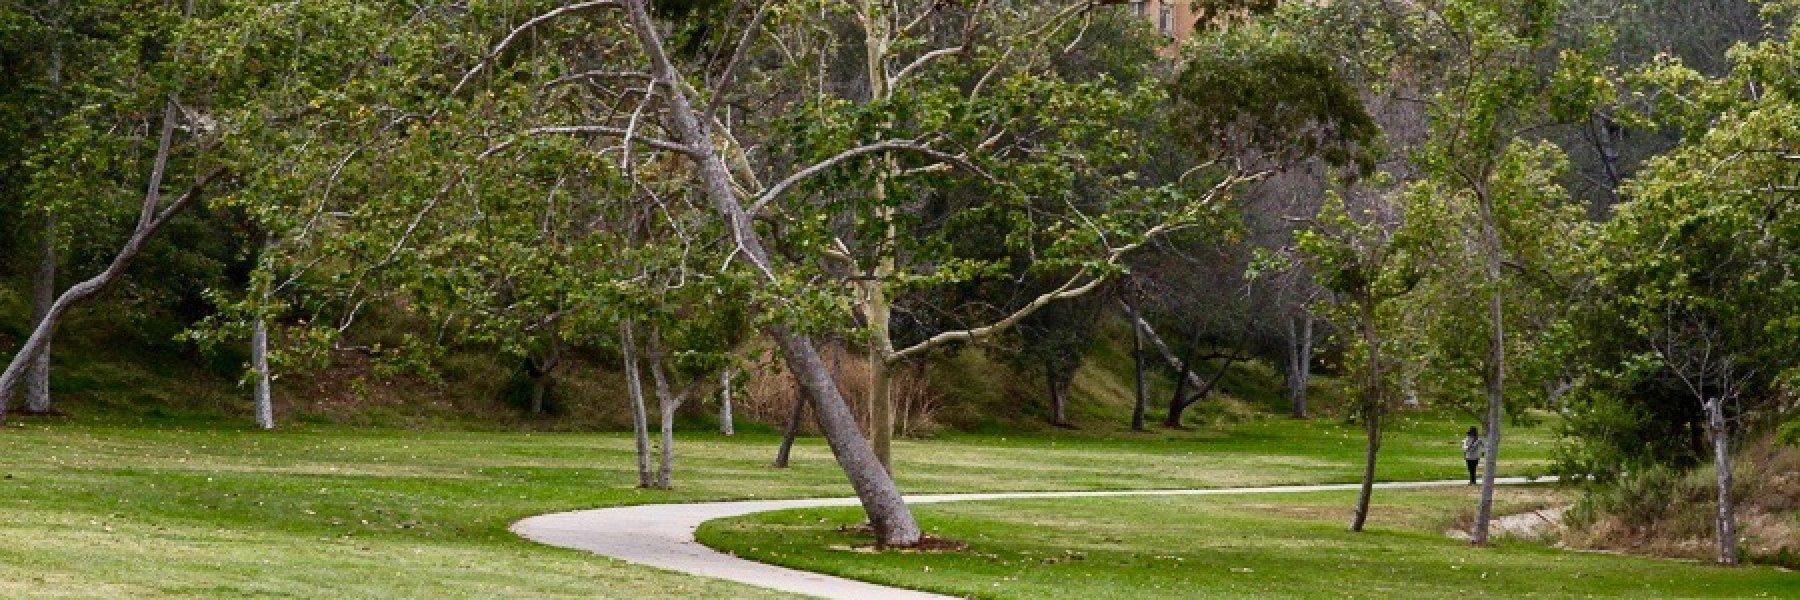 UTC is a community of attached homes in La Jolla California